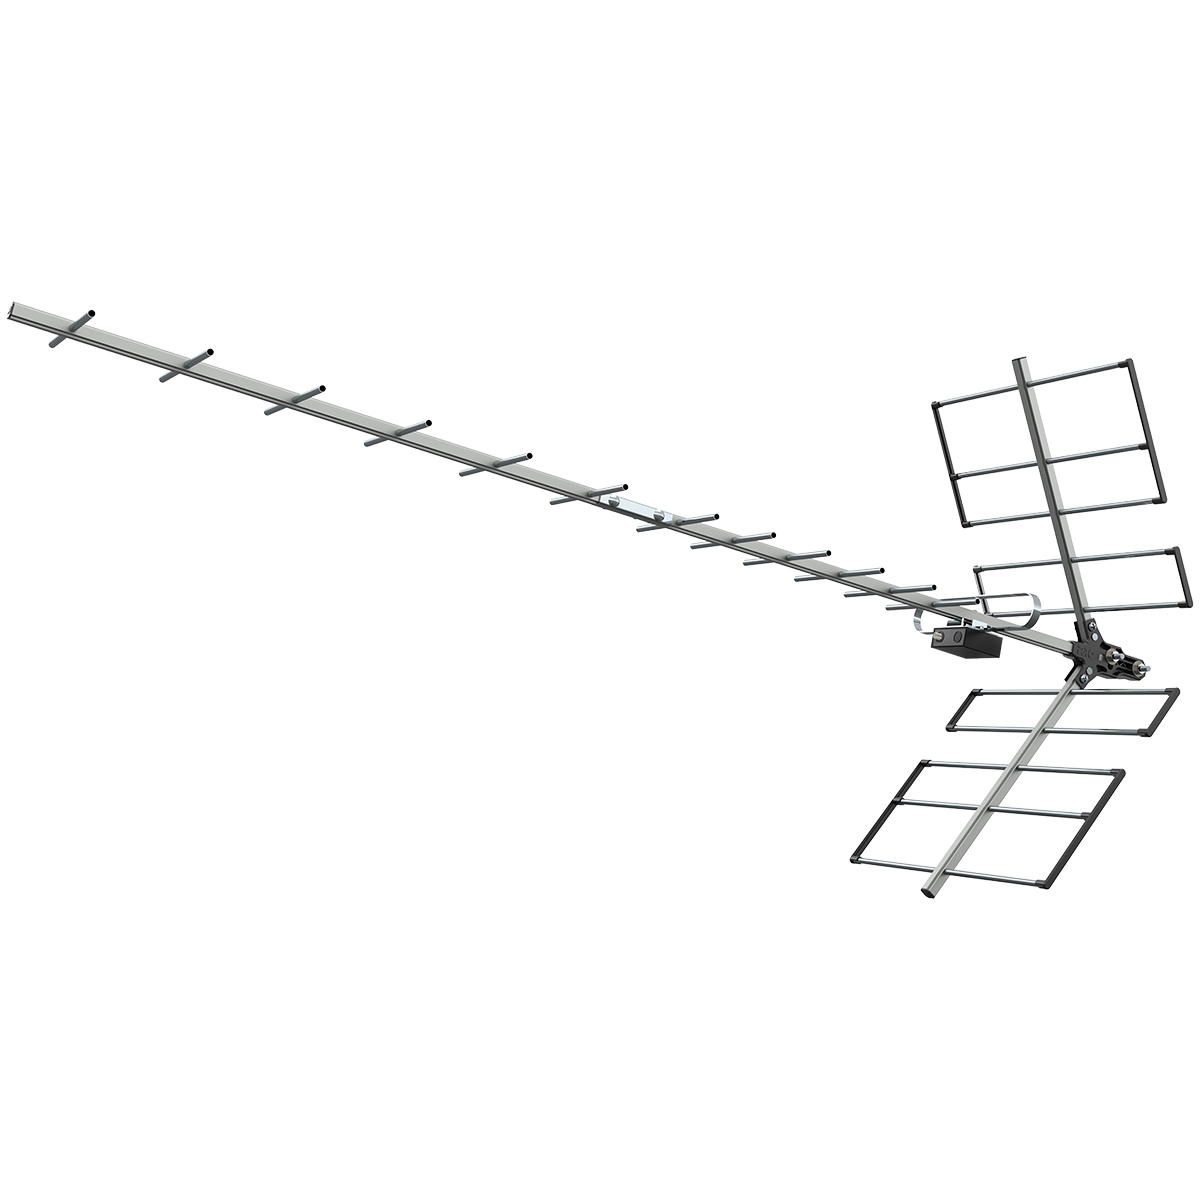 ANTENA UHF DIGITAL YAGI PROHD-1118